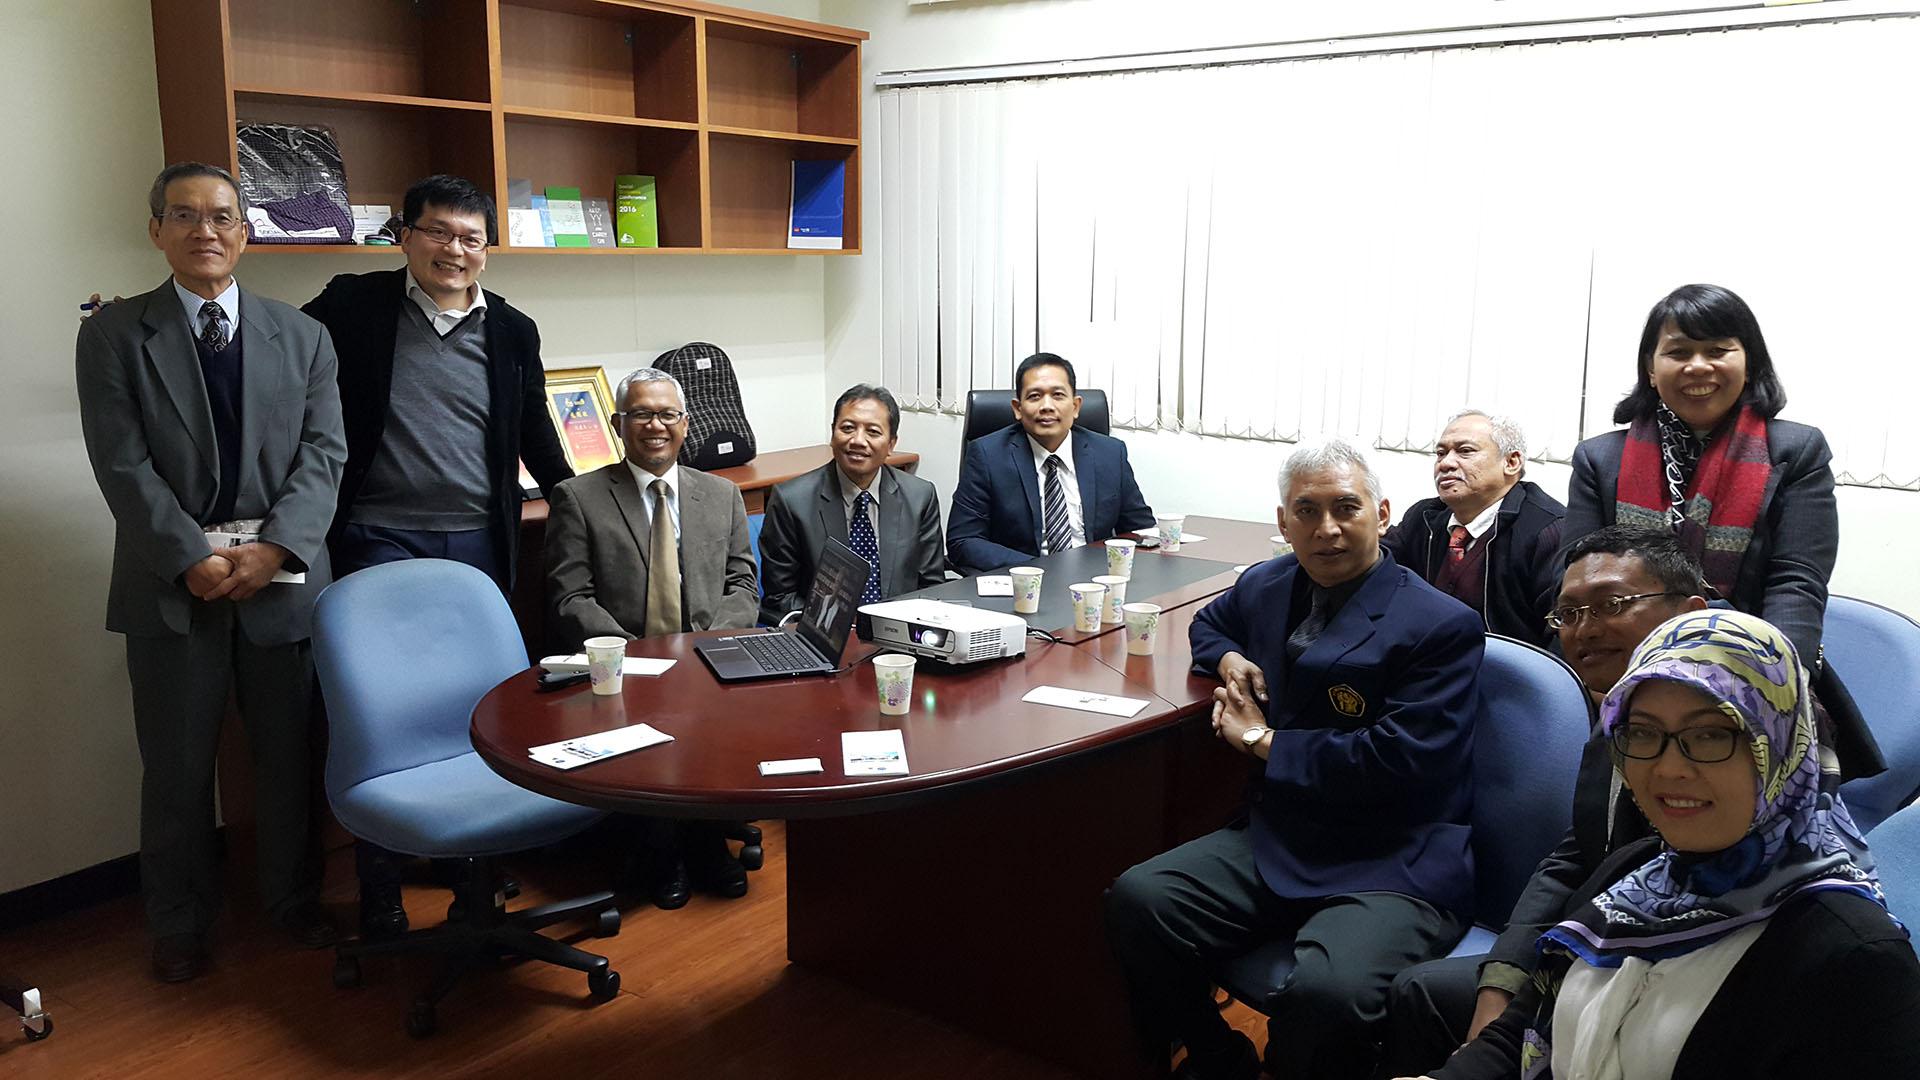 參訪後合影留念(左一:洪榮華教授、左二:沈建文主任、左三:Prof. Dr. Candra Fajri Ananda、左四Prof. Dr. Bambang Supriyono、左六: Prof. Dr. Ir. Muhammad Bisri、左七Prof. Dr. Ir. Kusmartono)